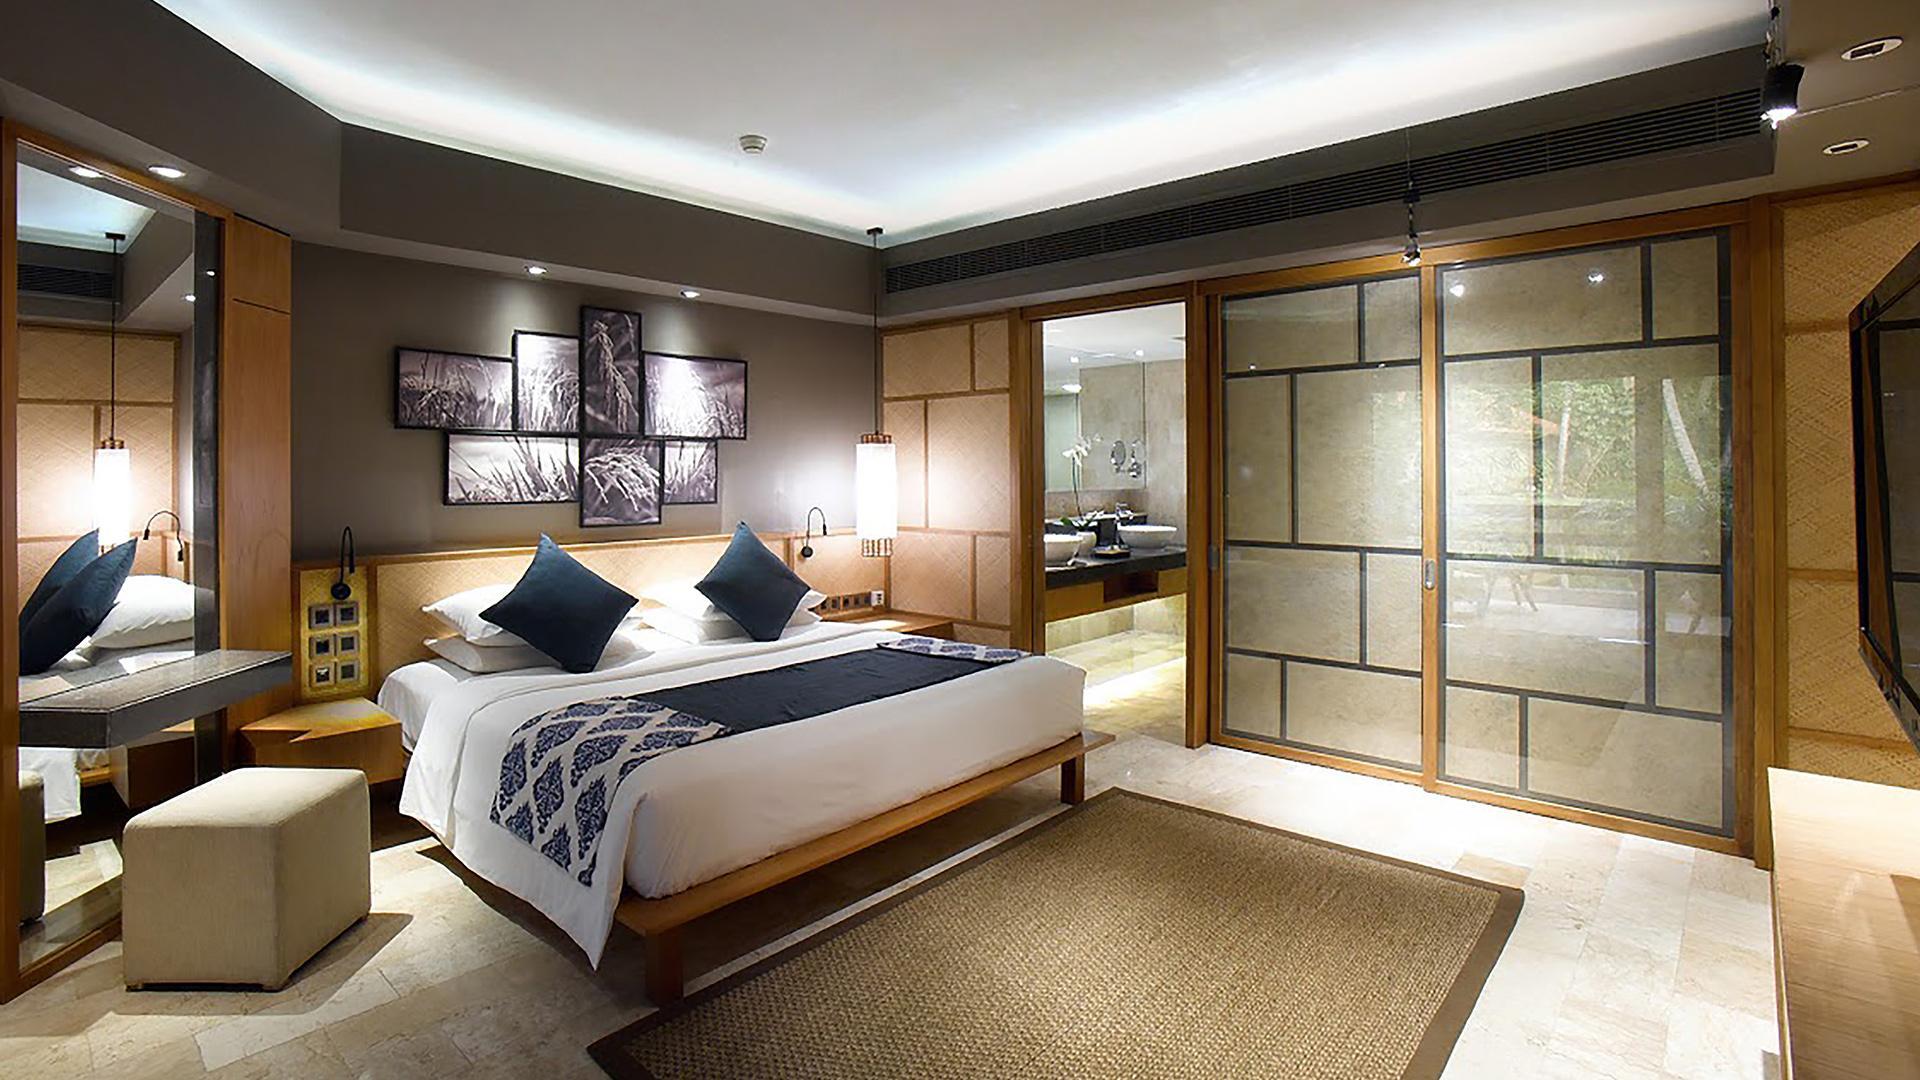 Grand Suite Club Access image 1 at Grand Hyatt Bali by Kabupaten Badung, Bali, Indonesia